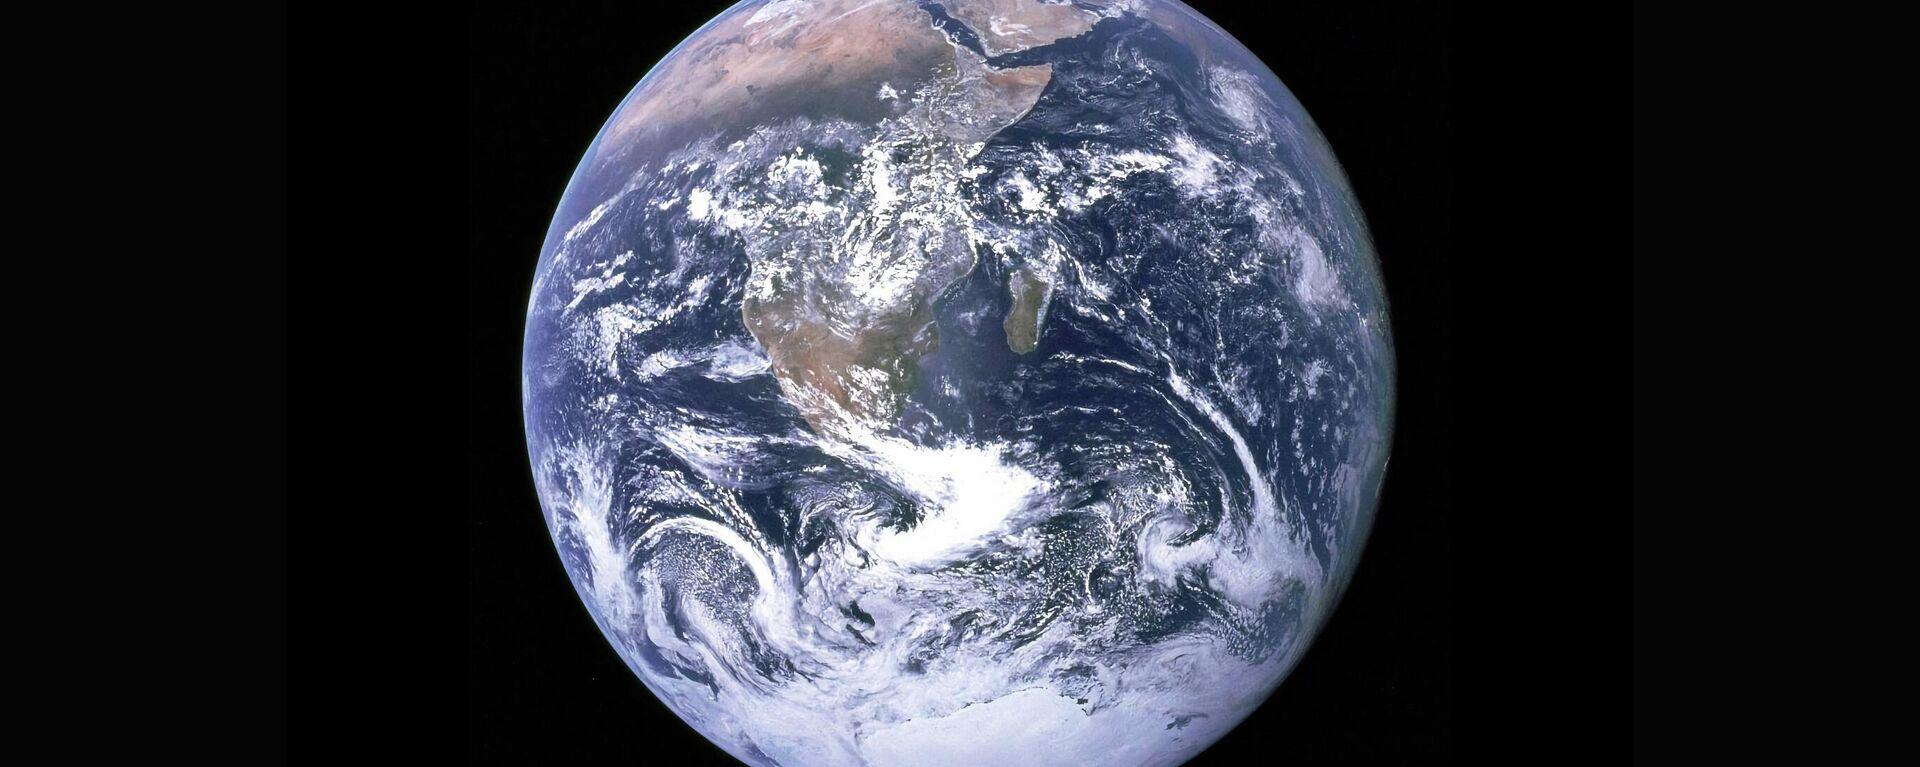 Planet Earth - Sputnik Mundo, 1920, 23.06.2021